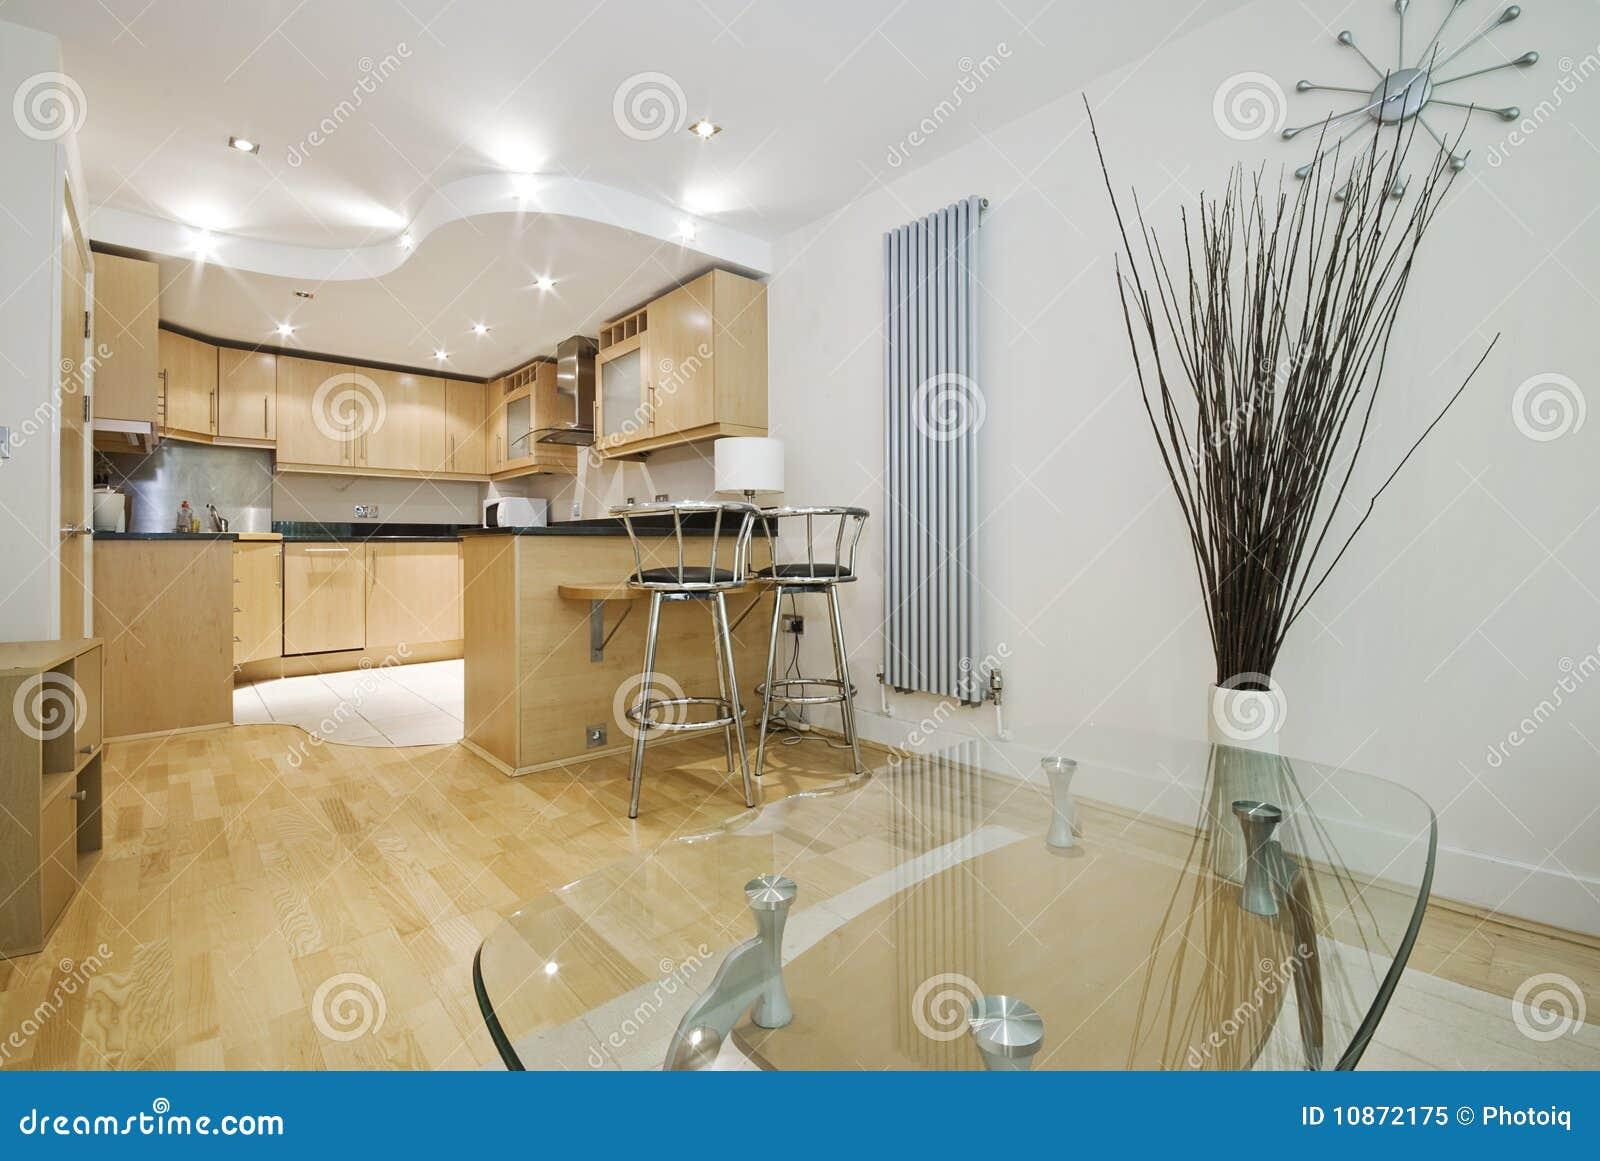 Cucina aperta di programma di rivestimento di legno for Cucina aperta